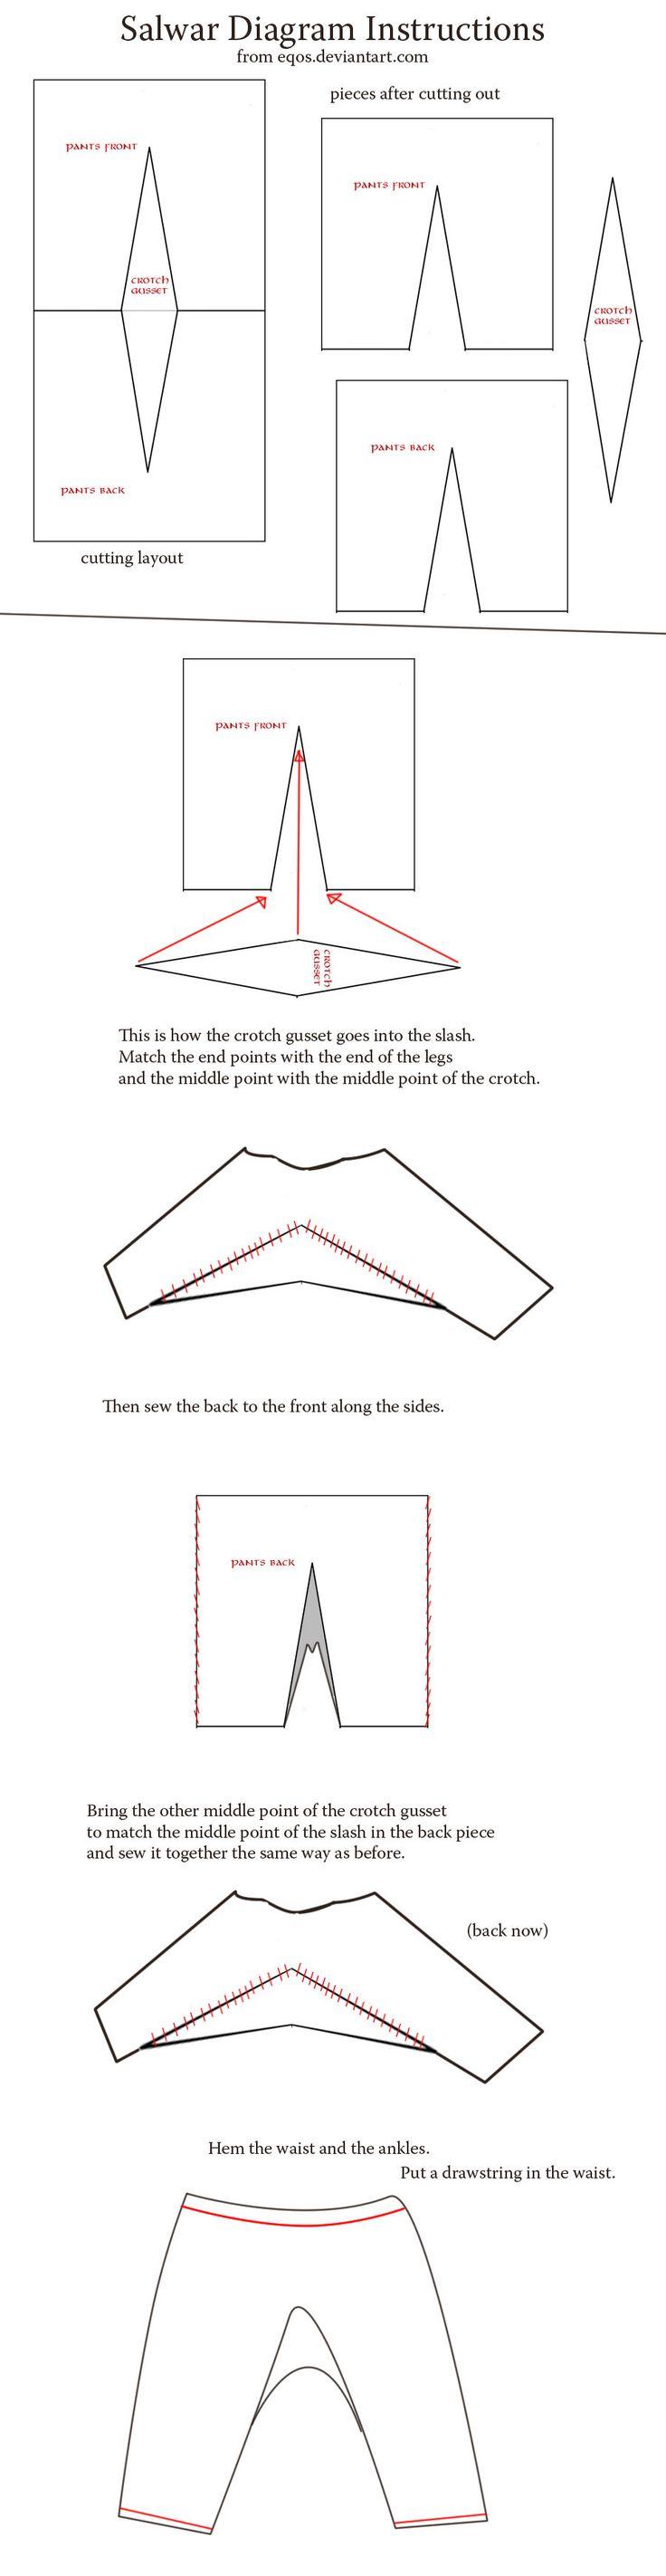 Salwar Diagram Instructions by eqos.deviantart.com on @deviantART